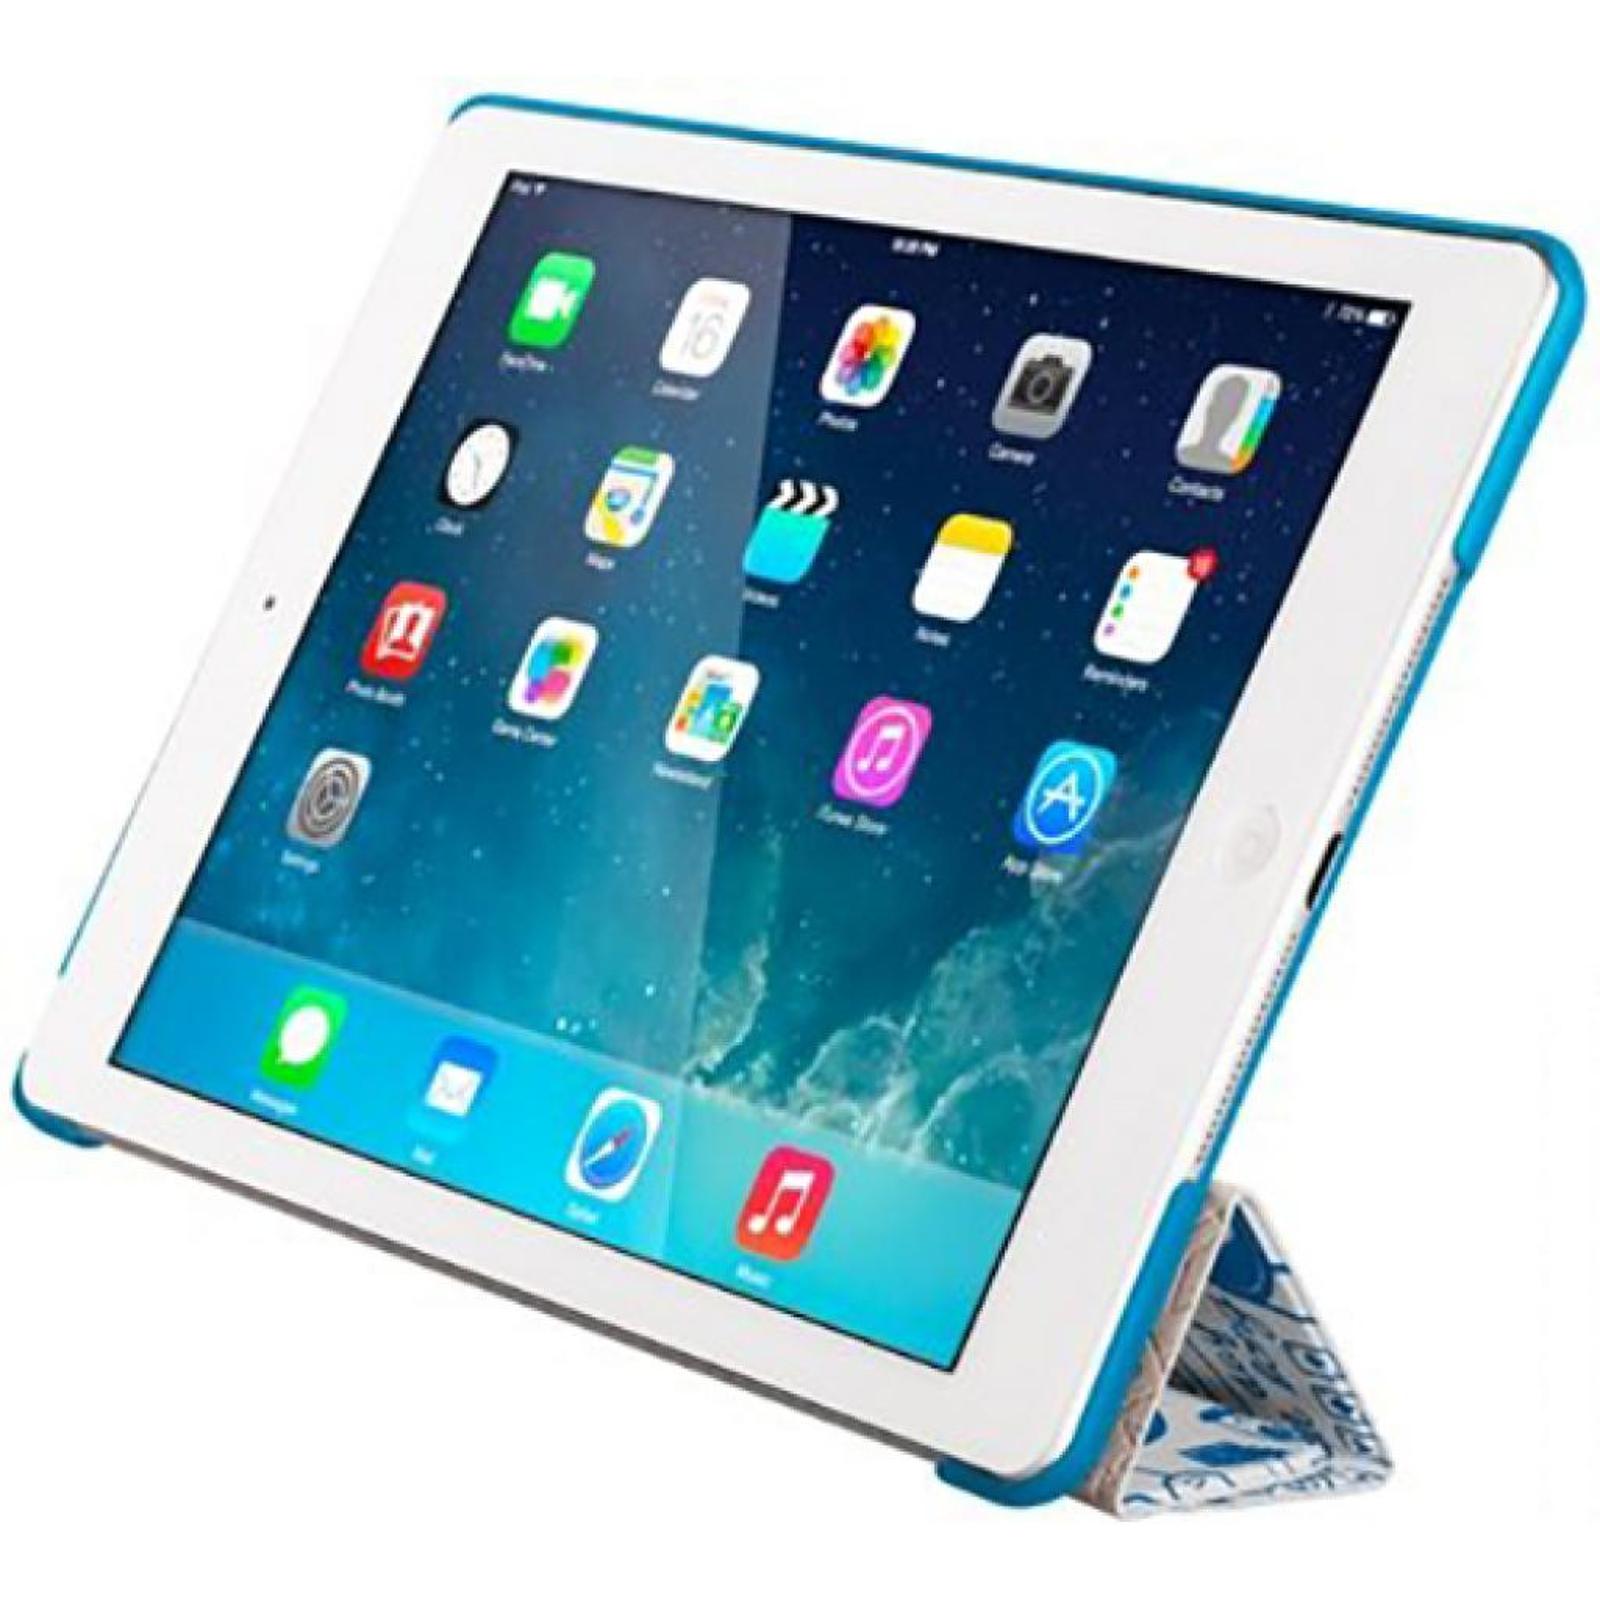 Чехол для планшета OZAKI iPad Air O!coat-Relax 360° Blue (OC113BU) изображение 3